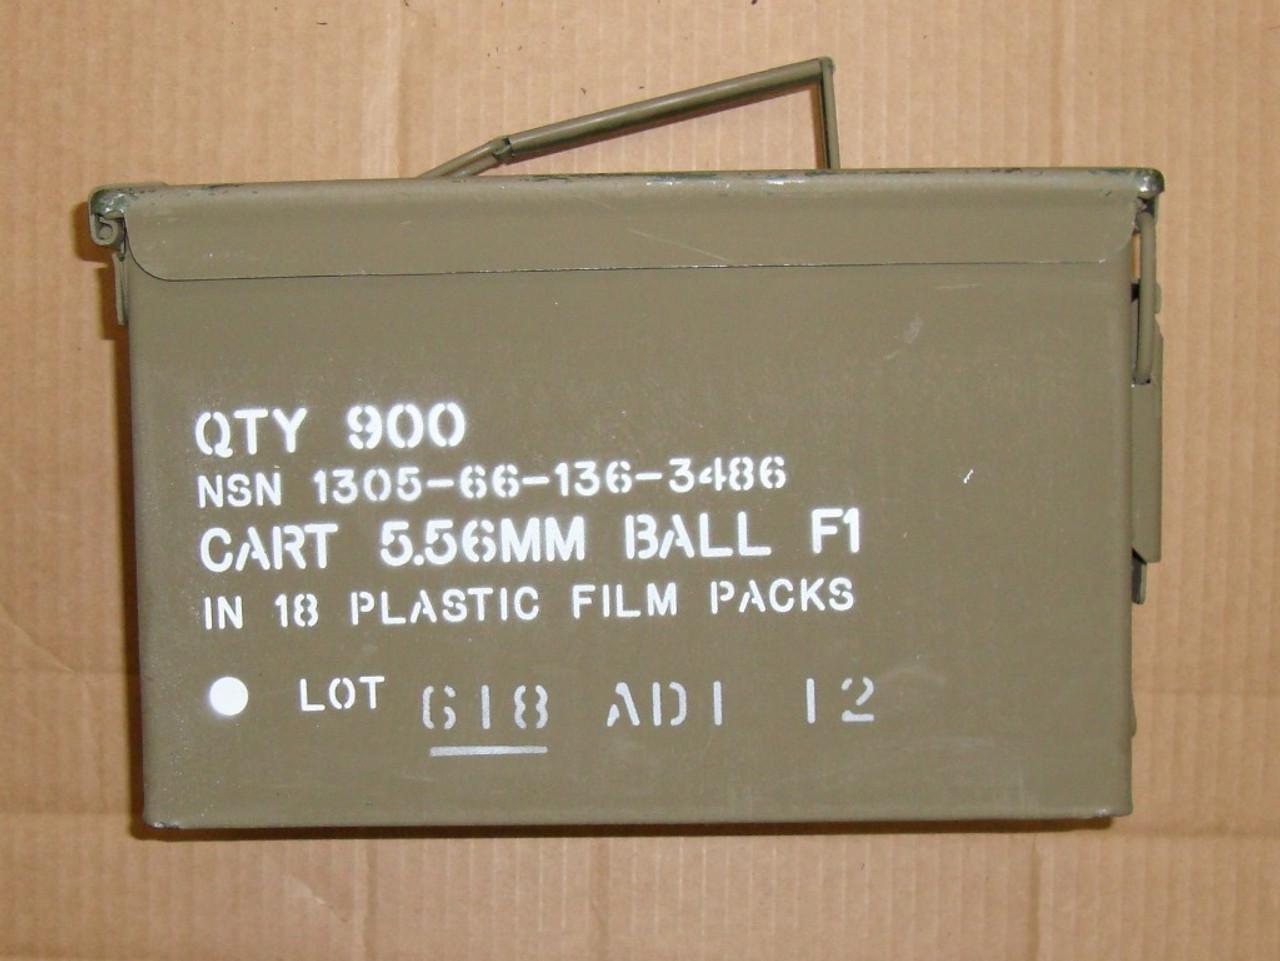 M855 .223 / 5.56mm SS109 62gr Penetrator<br>ADI 2012<br> 900rd Can <br>NON-Corrosive / Boxer Primed Reloadable